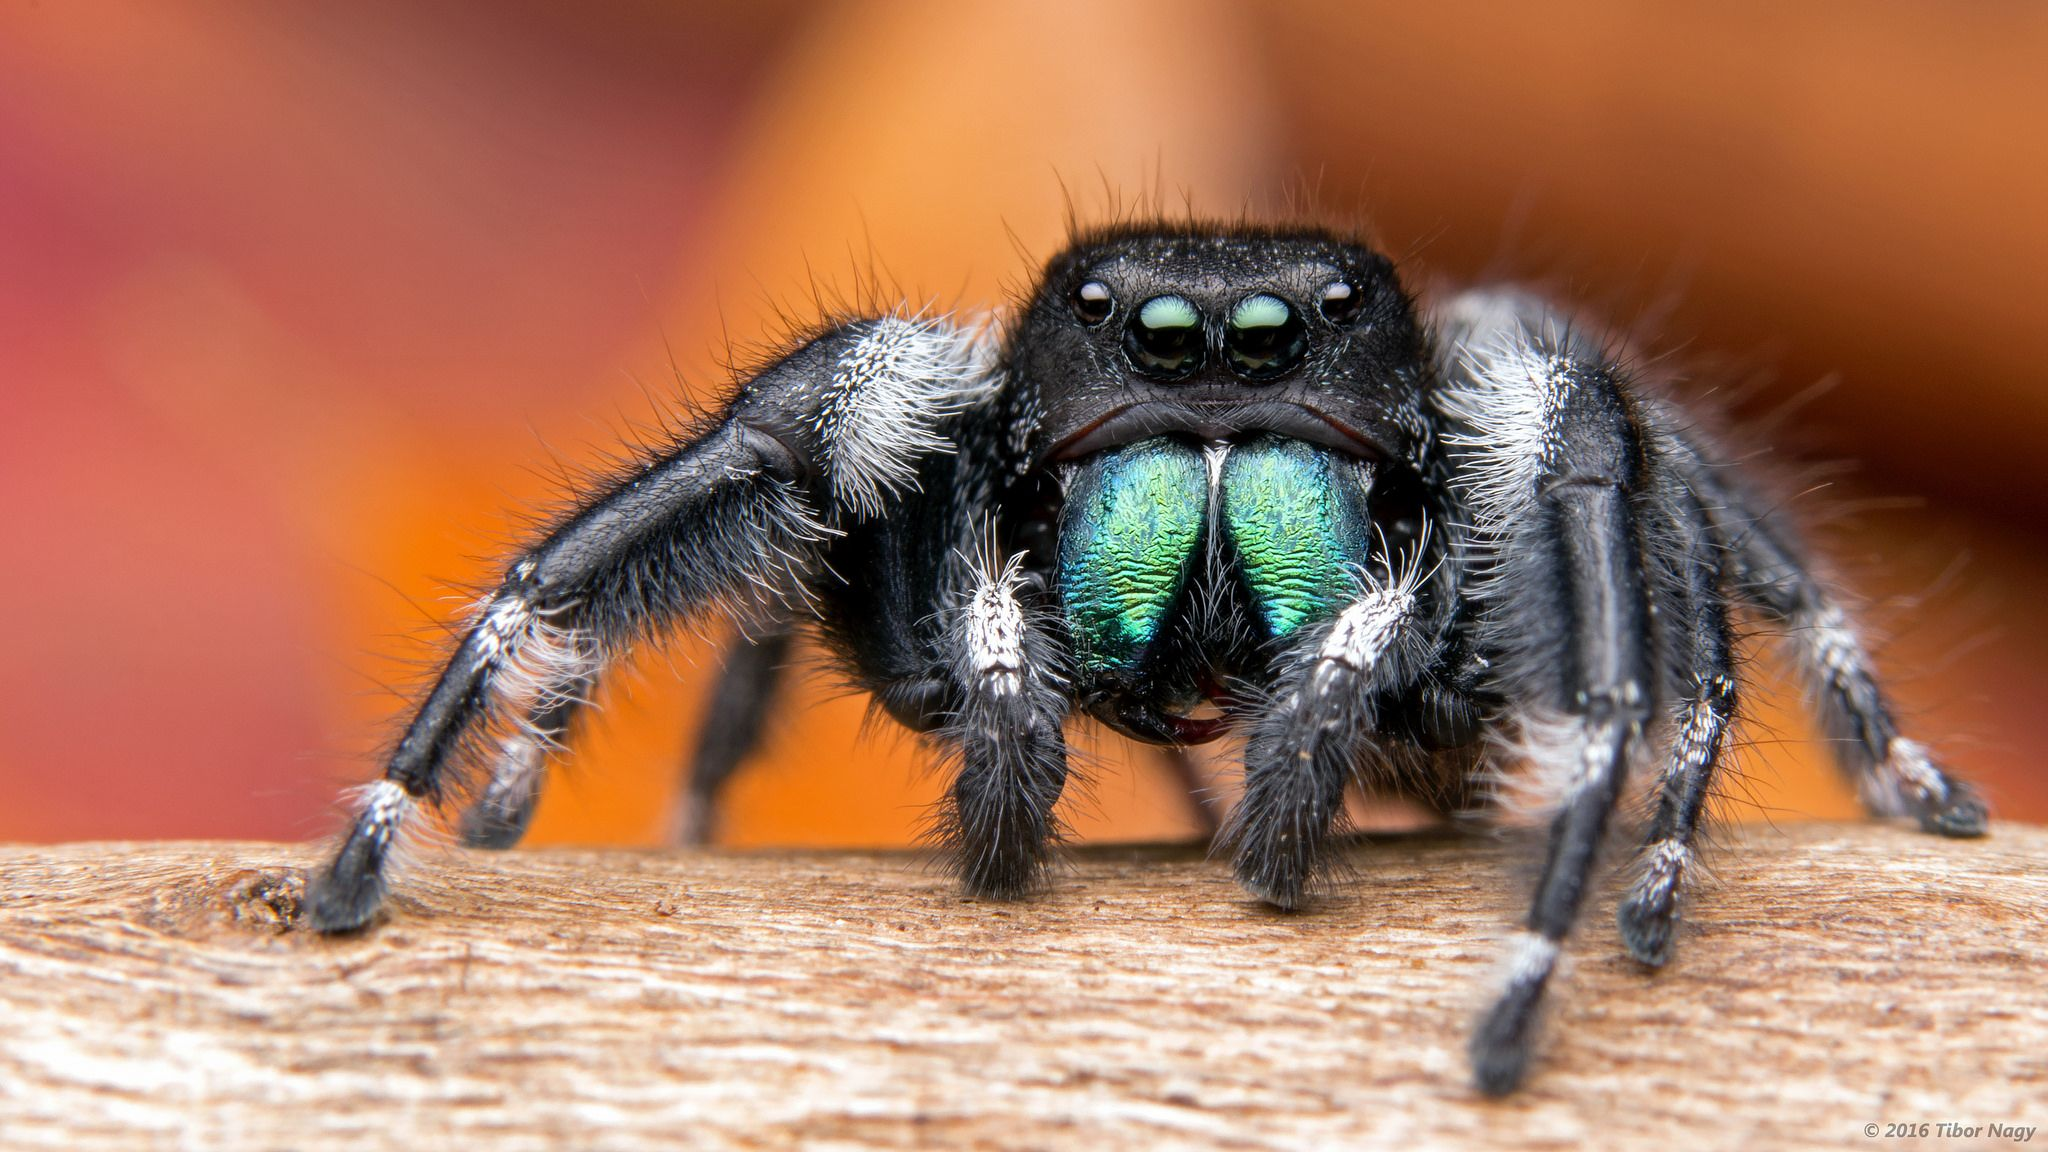 Phidippus audax bold jumping spider Jumping spider